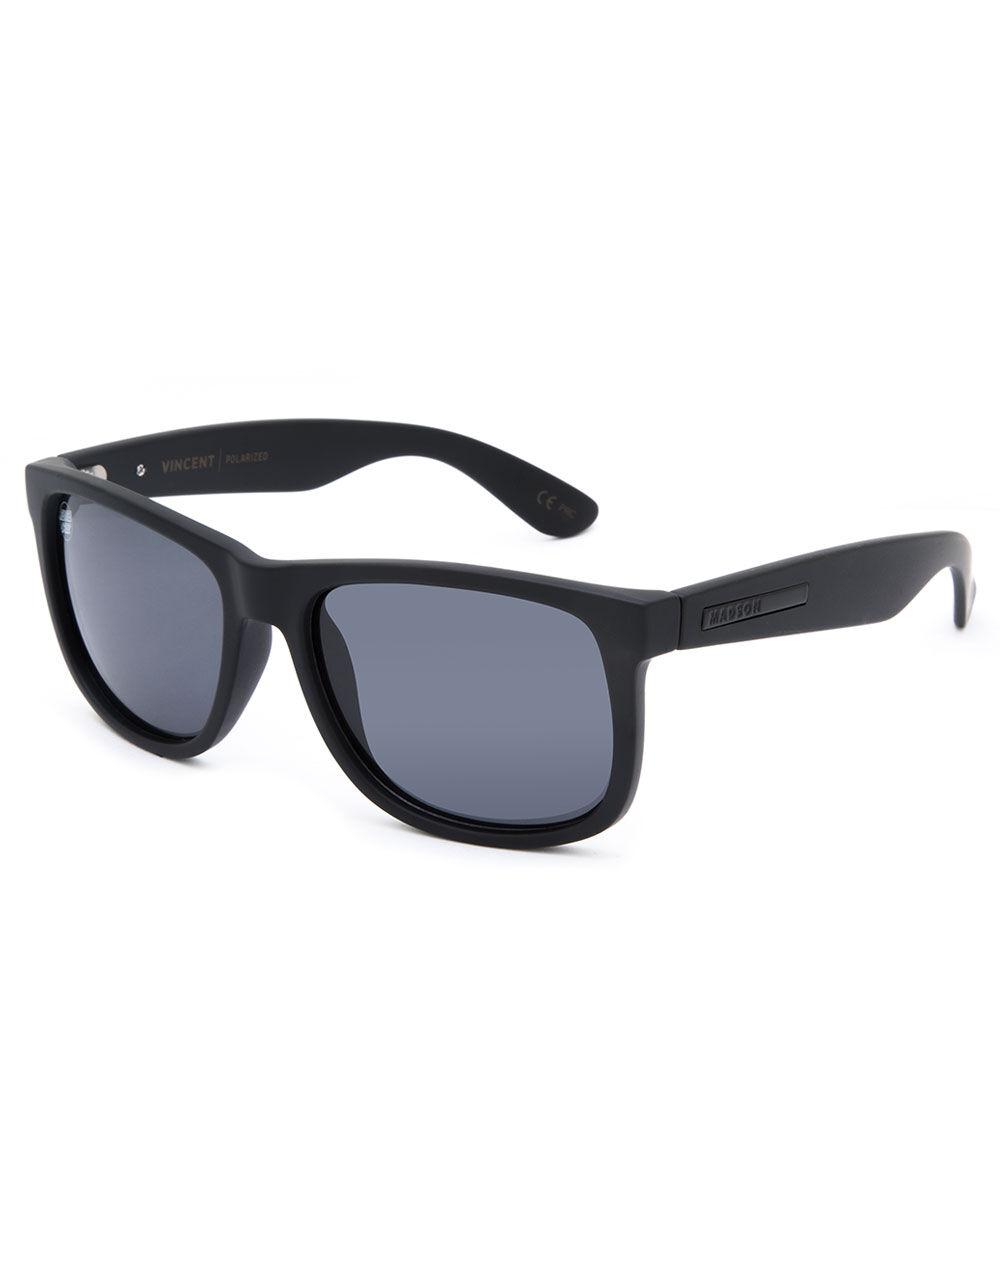 MADSON x Santa Cruz Vincent Guadalupe Sunglasses